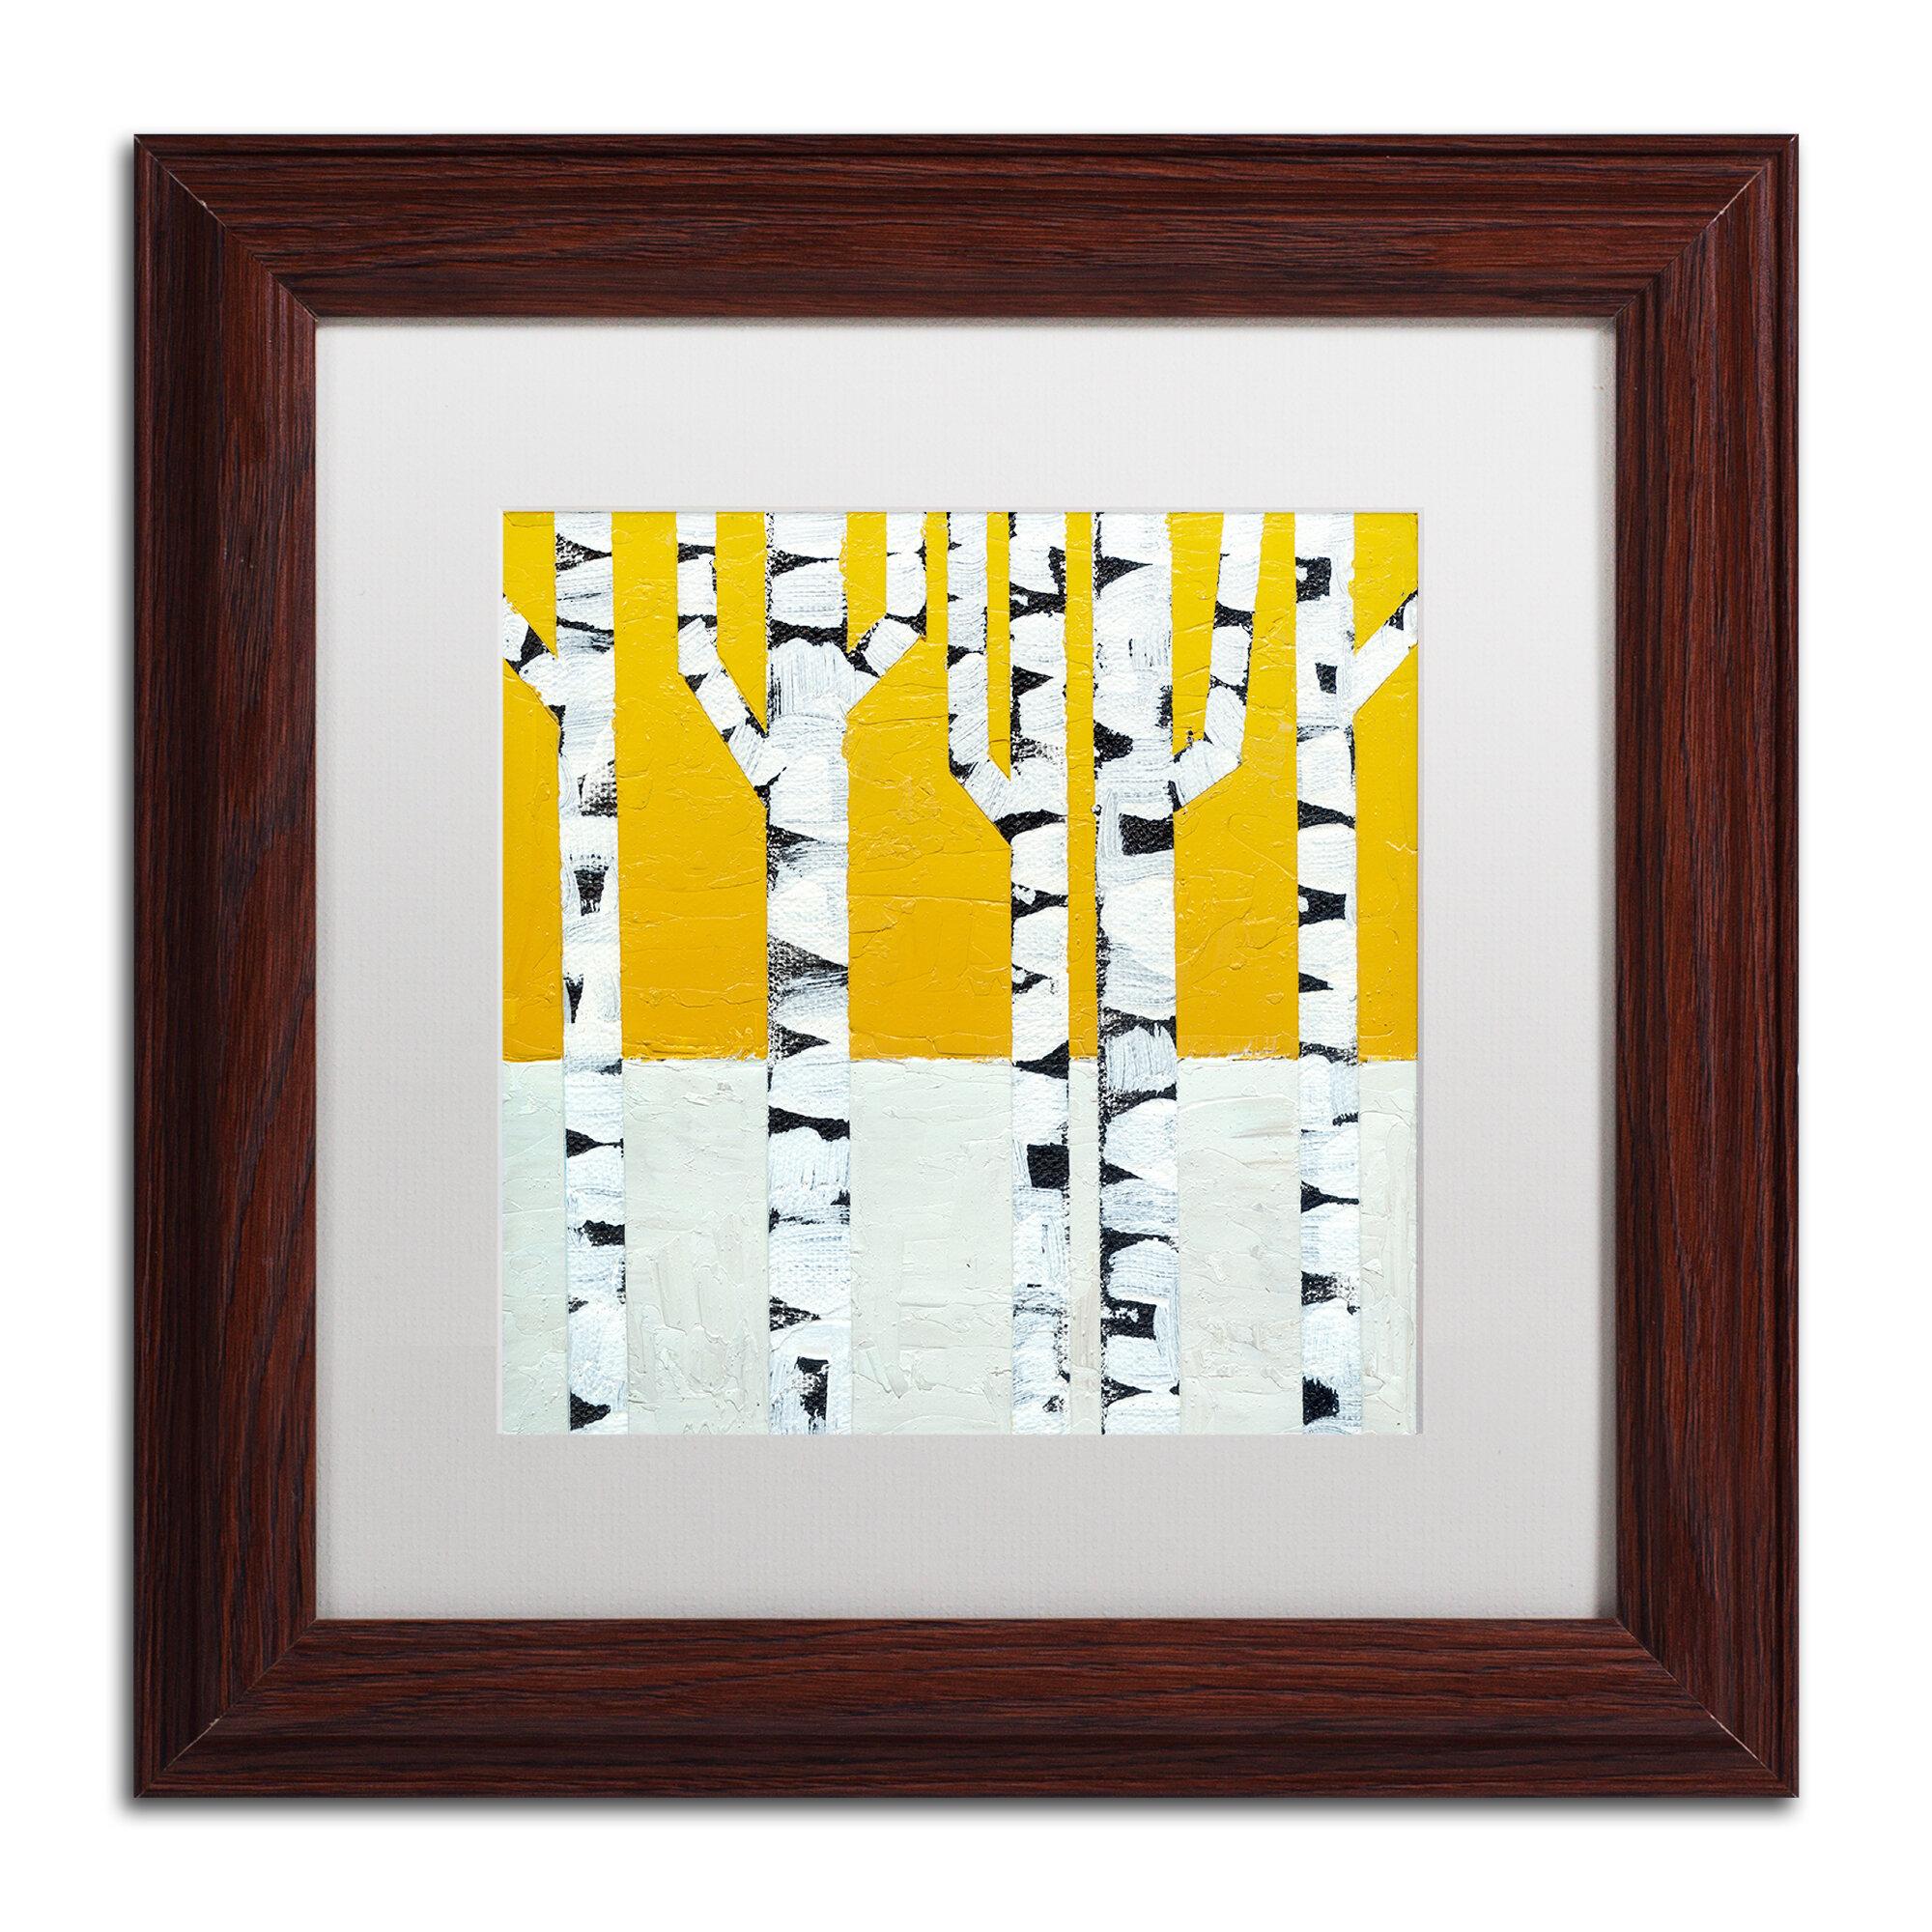 Trademark Art Seasonal Birches Winter By Michelle Calkins Framed Painting Print Wayfair